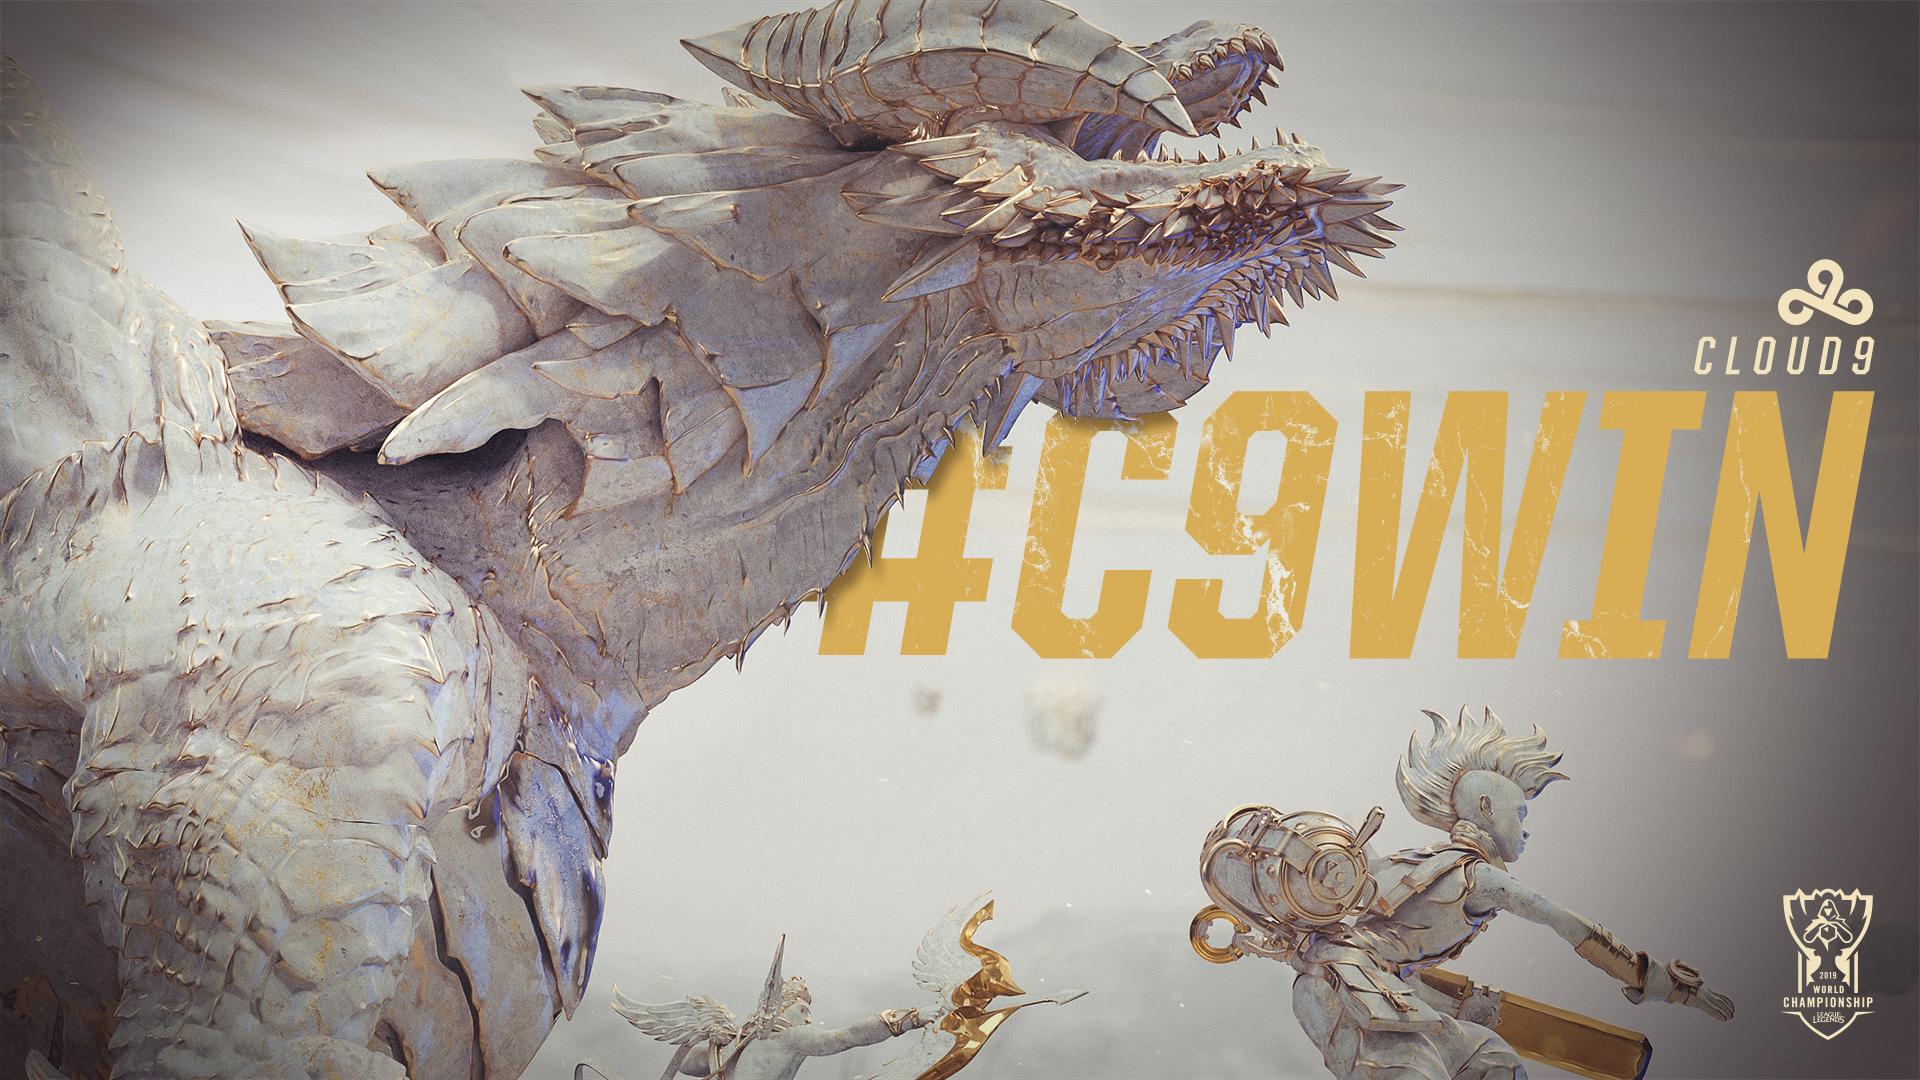 Download The Cloud9 Worlds Fan Kit League Of Legends